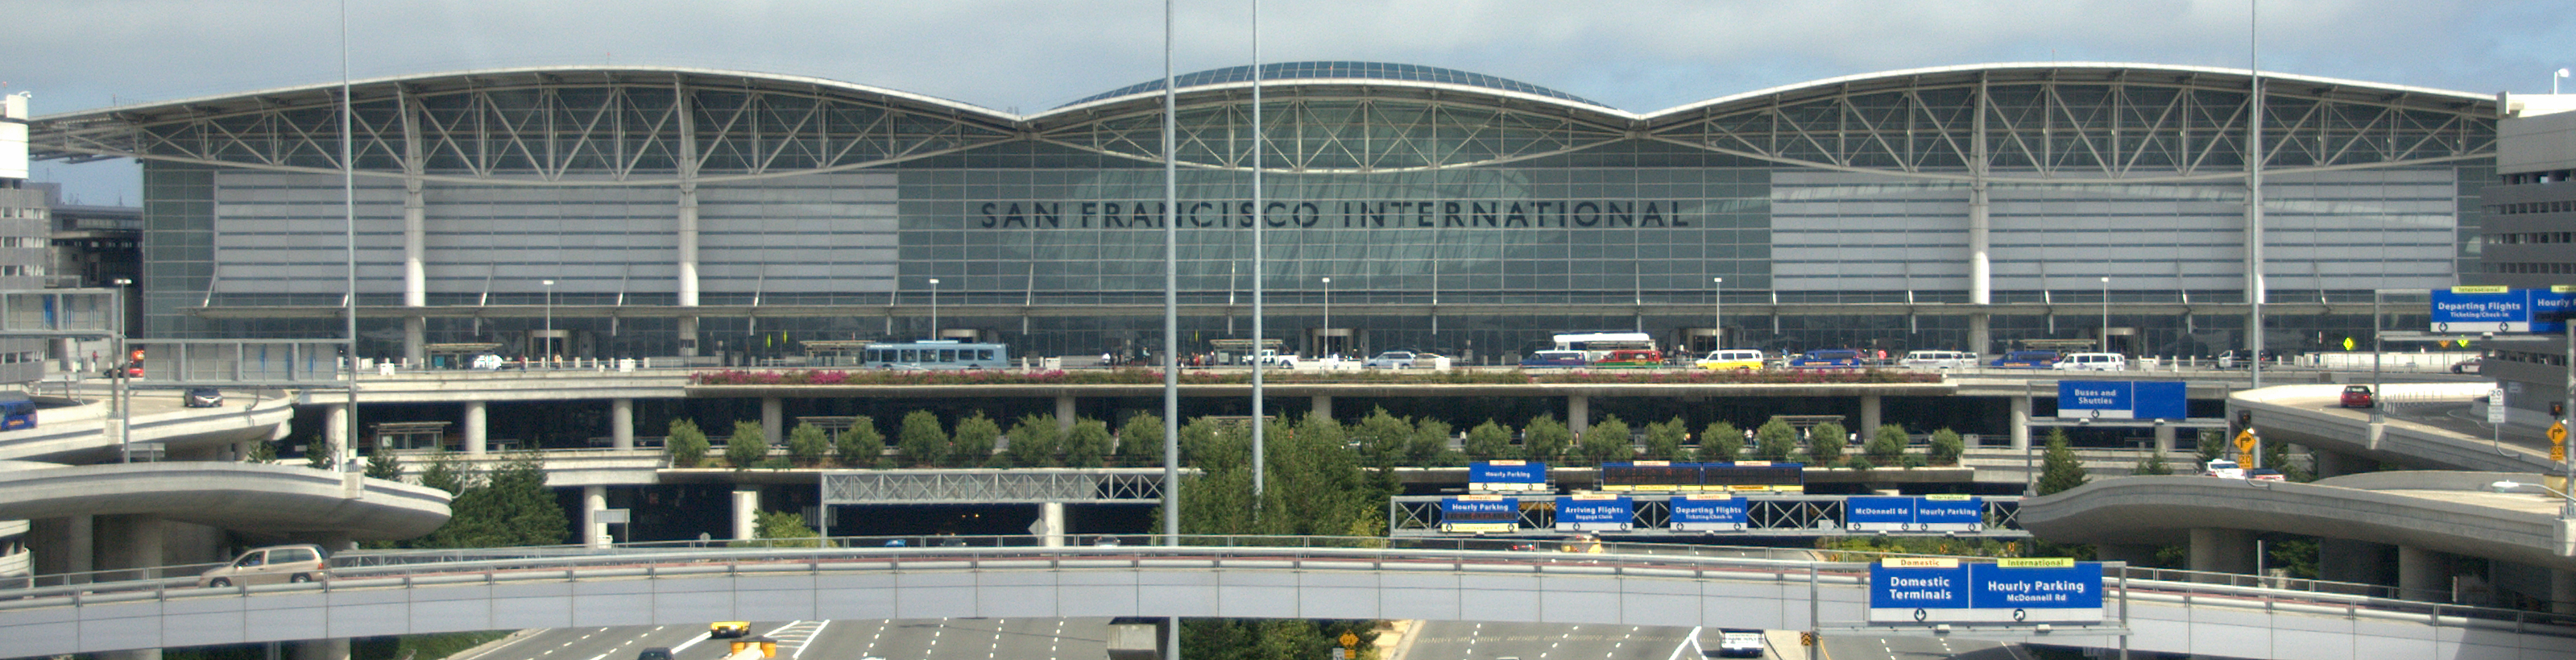 Sfo Airport Car Rental Drop Off Hours